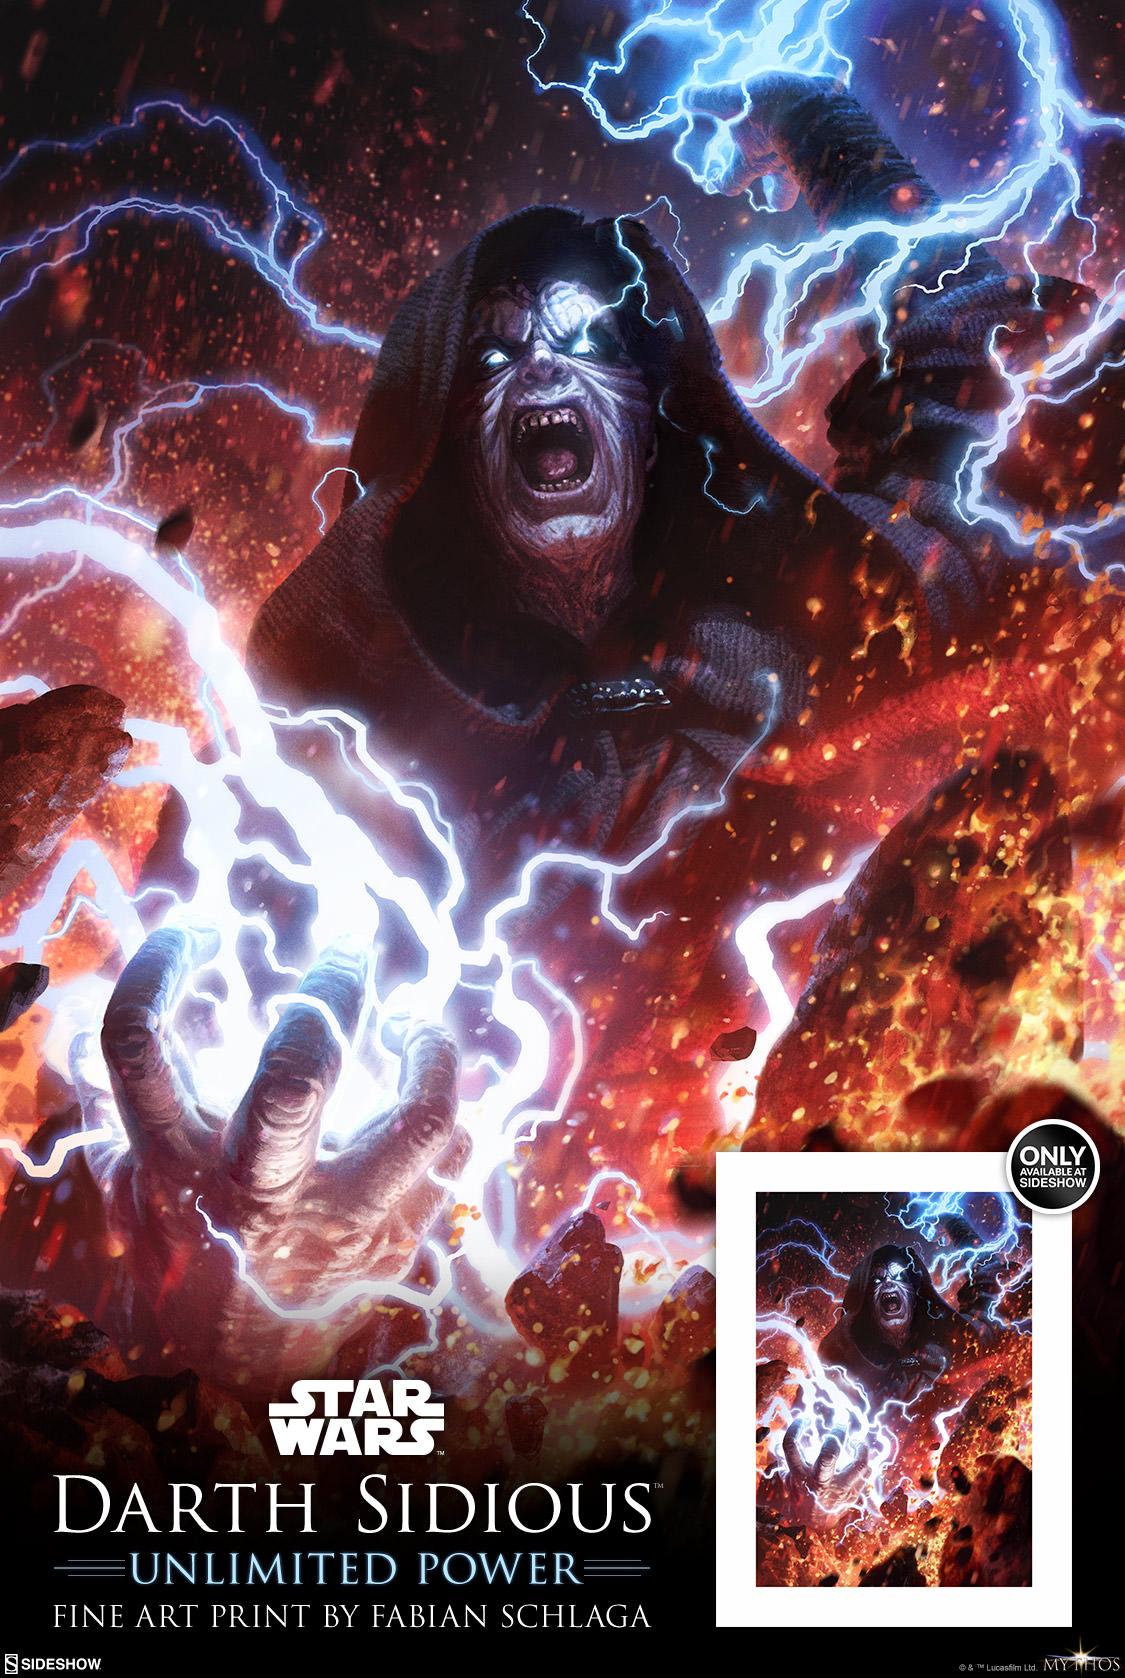 SW Darth Sidious: Unlimited Power Fine Art Print